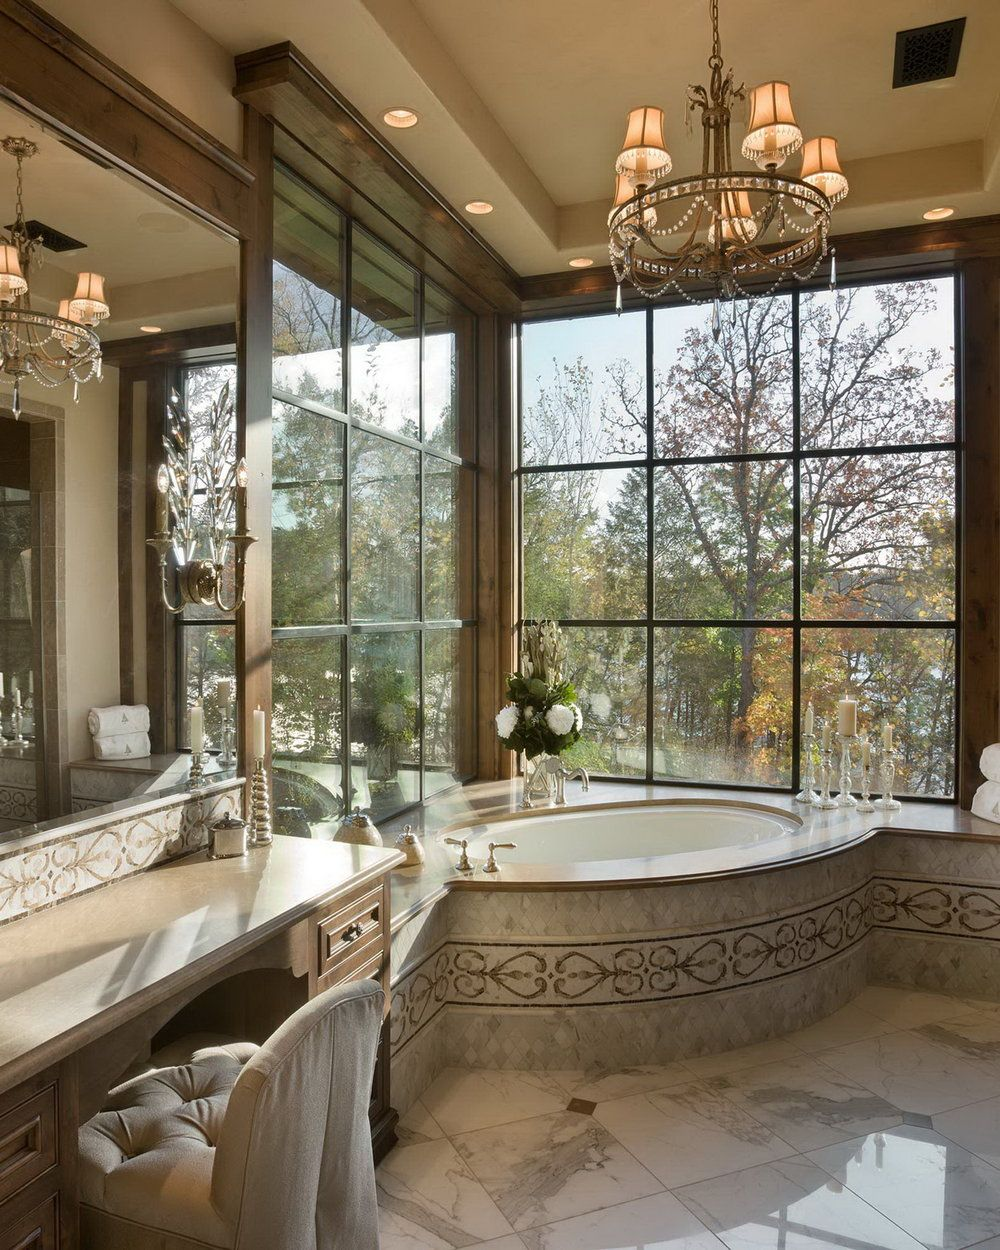 Chimney rock residence by locati architects rustichome cabin dream bathrooms beautiful also in bathroom ideas rh pinterest